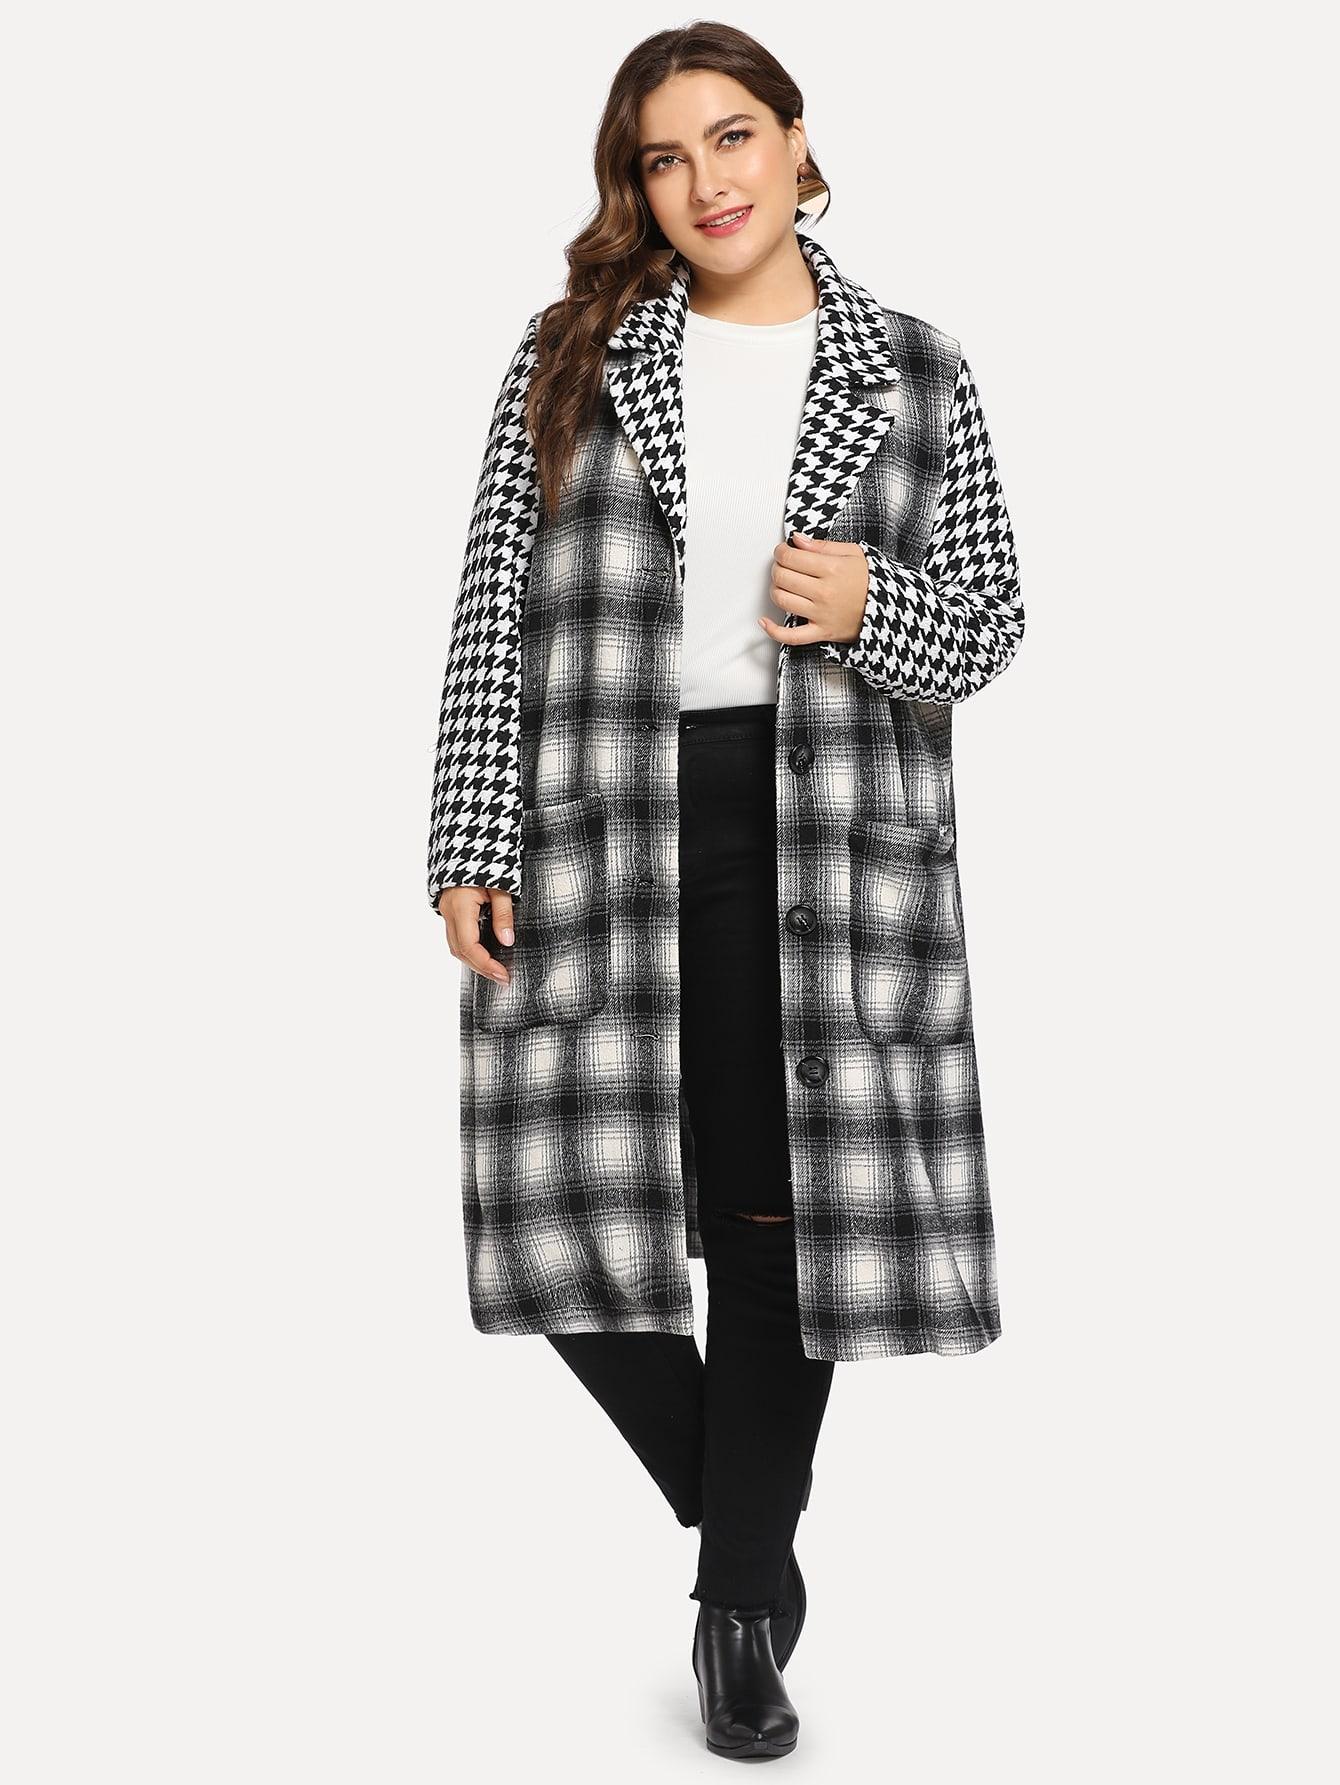 Фото - Плюс размера пальто на пуговицах от SheIn цвет чёрнобелые